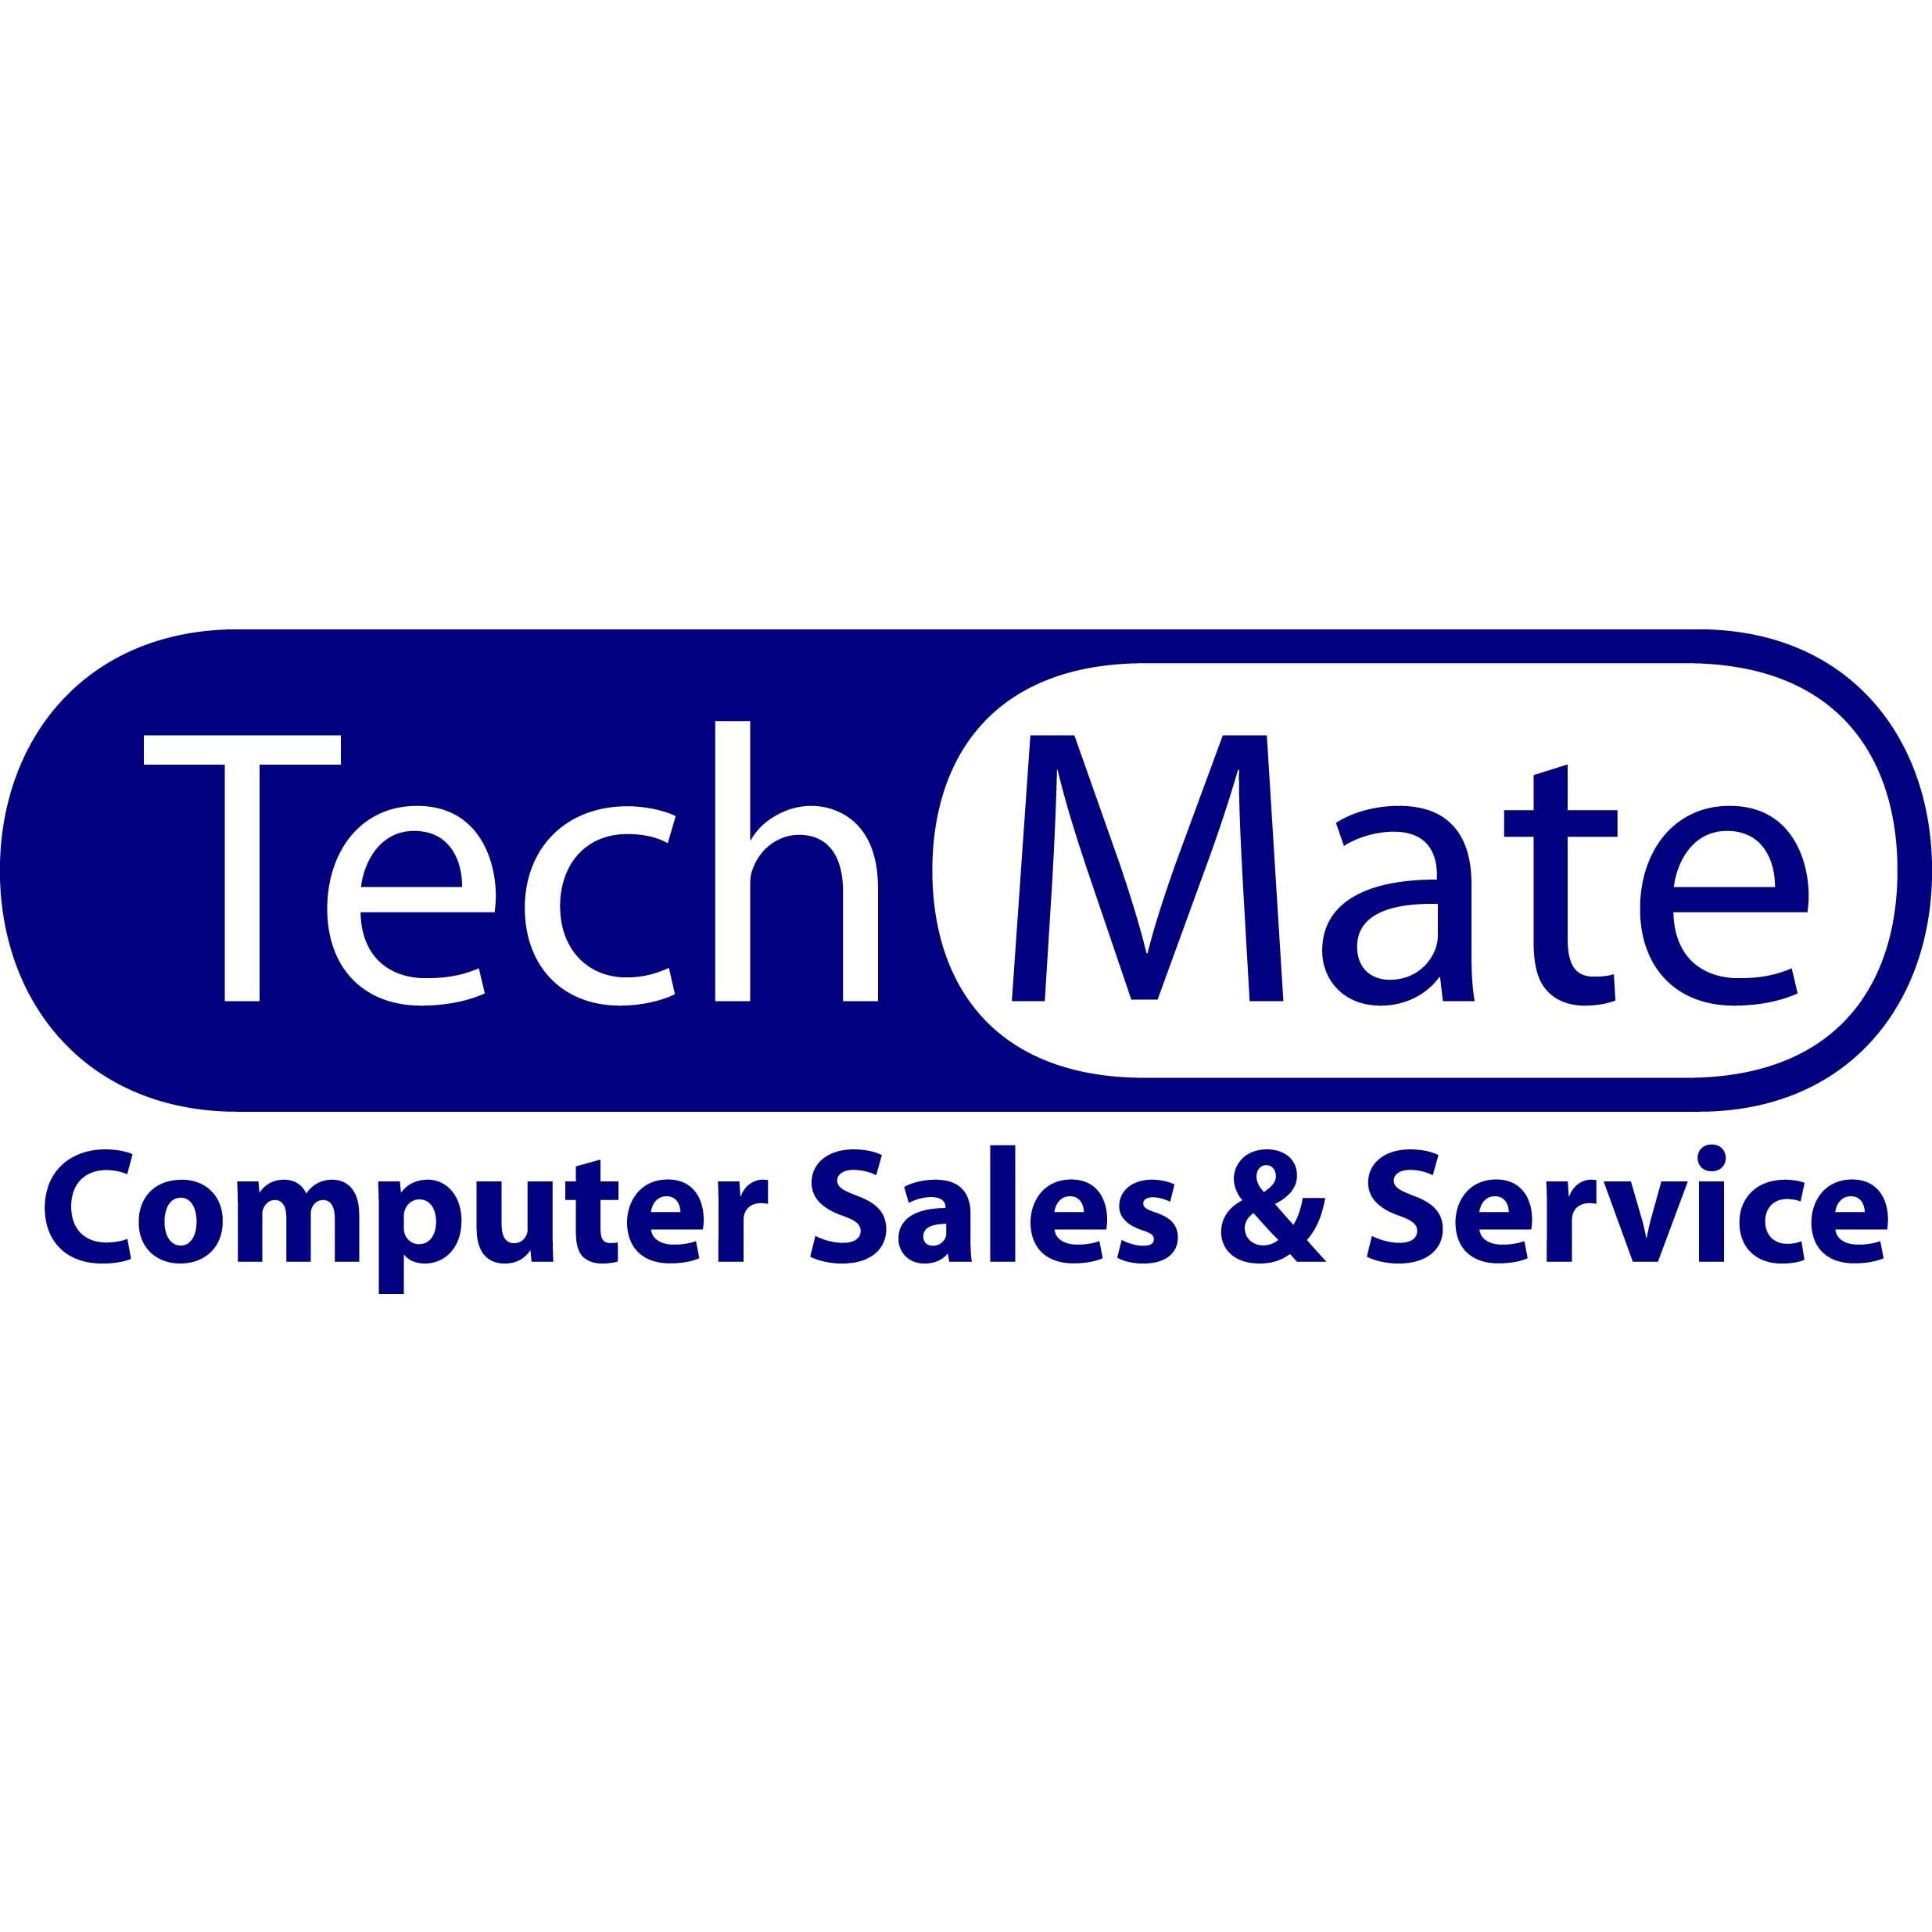 TechMate Computer Sales & Service